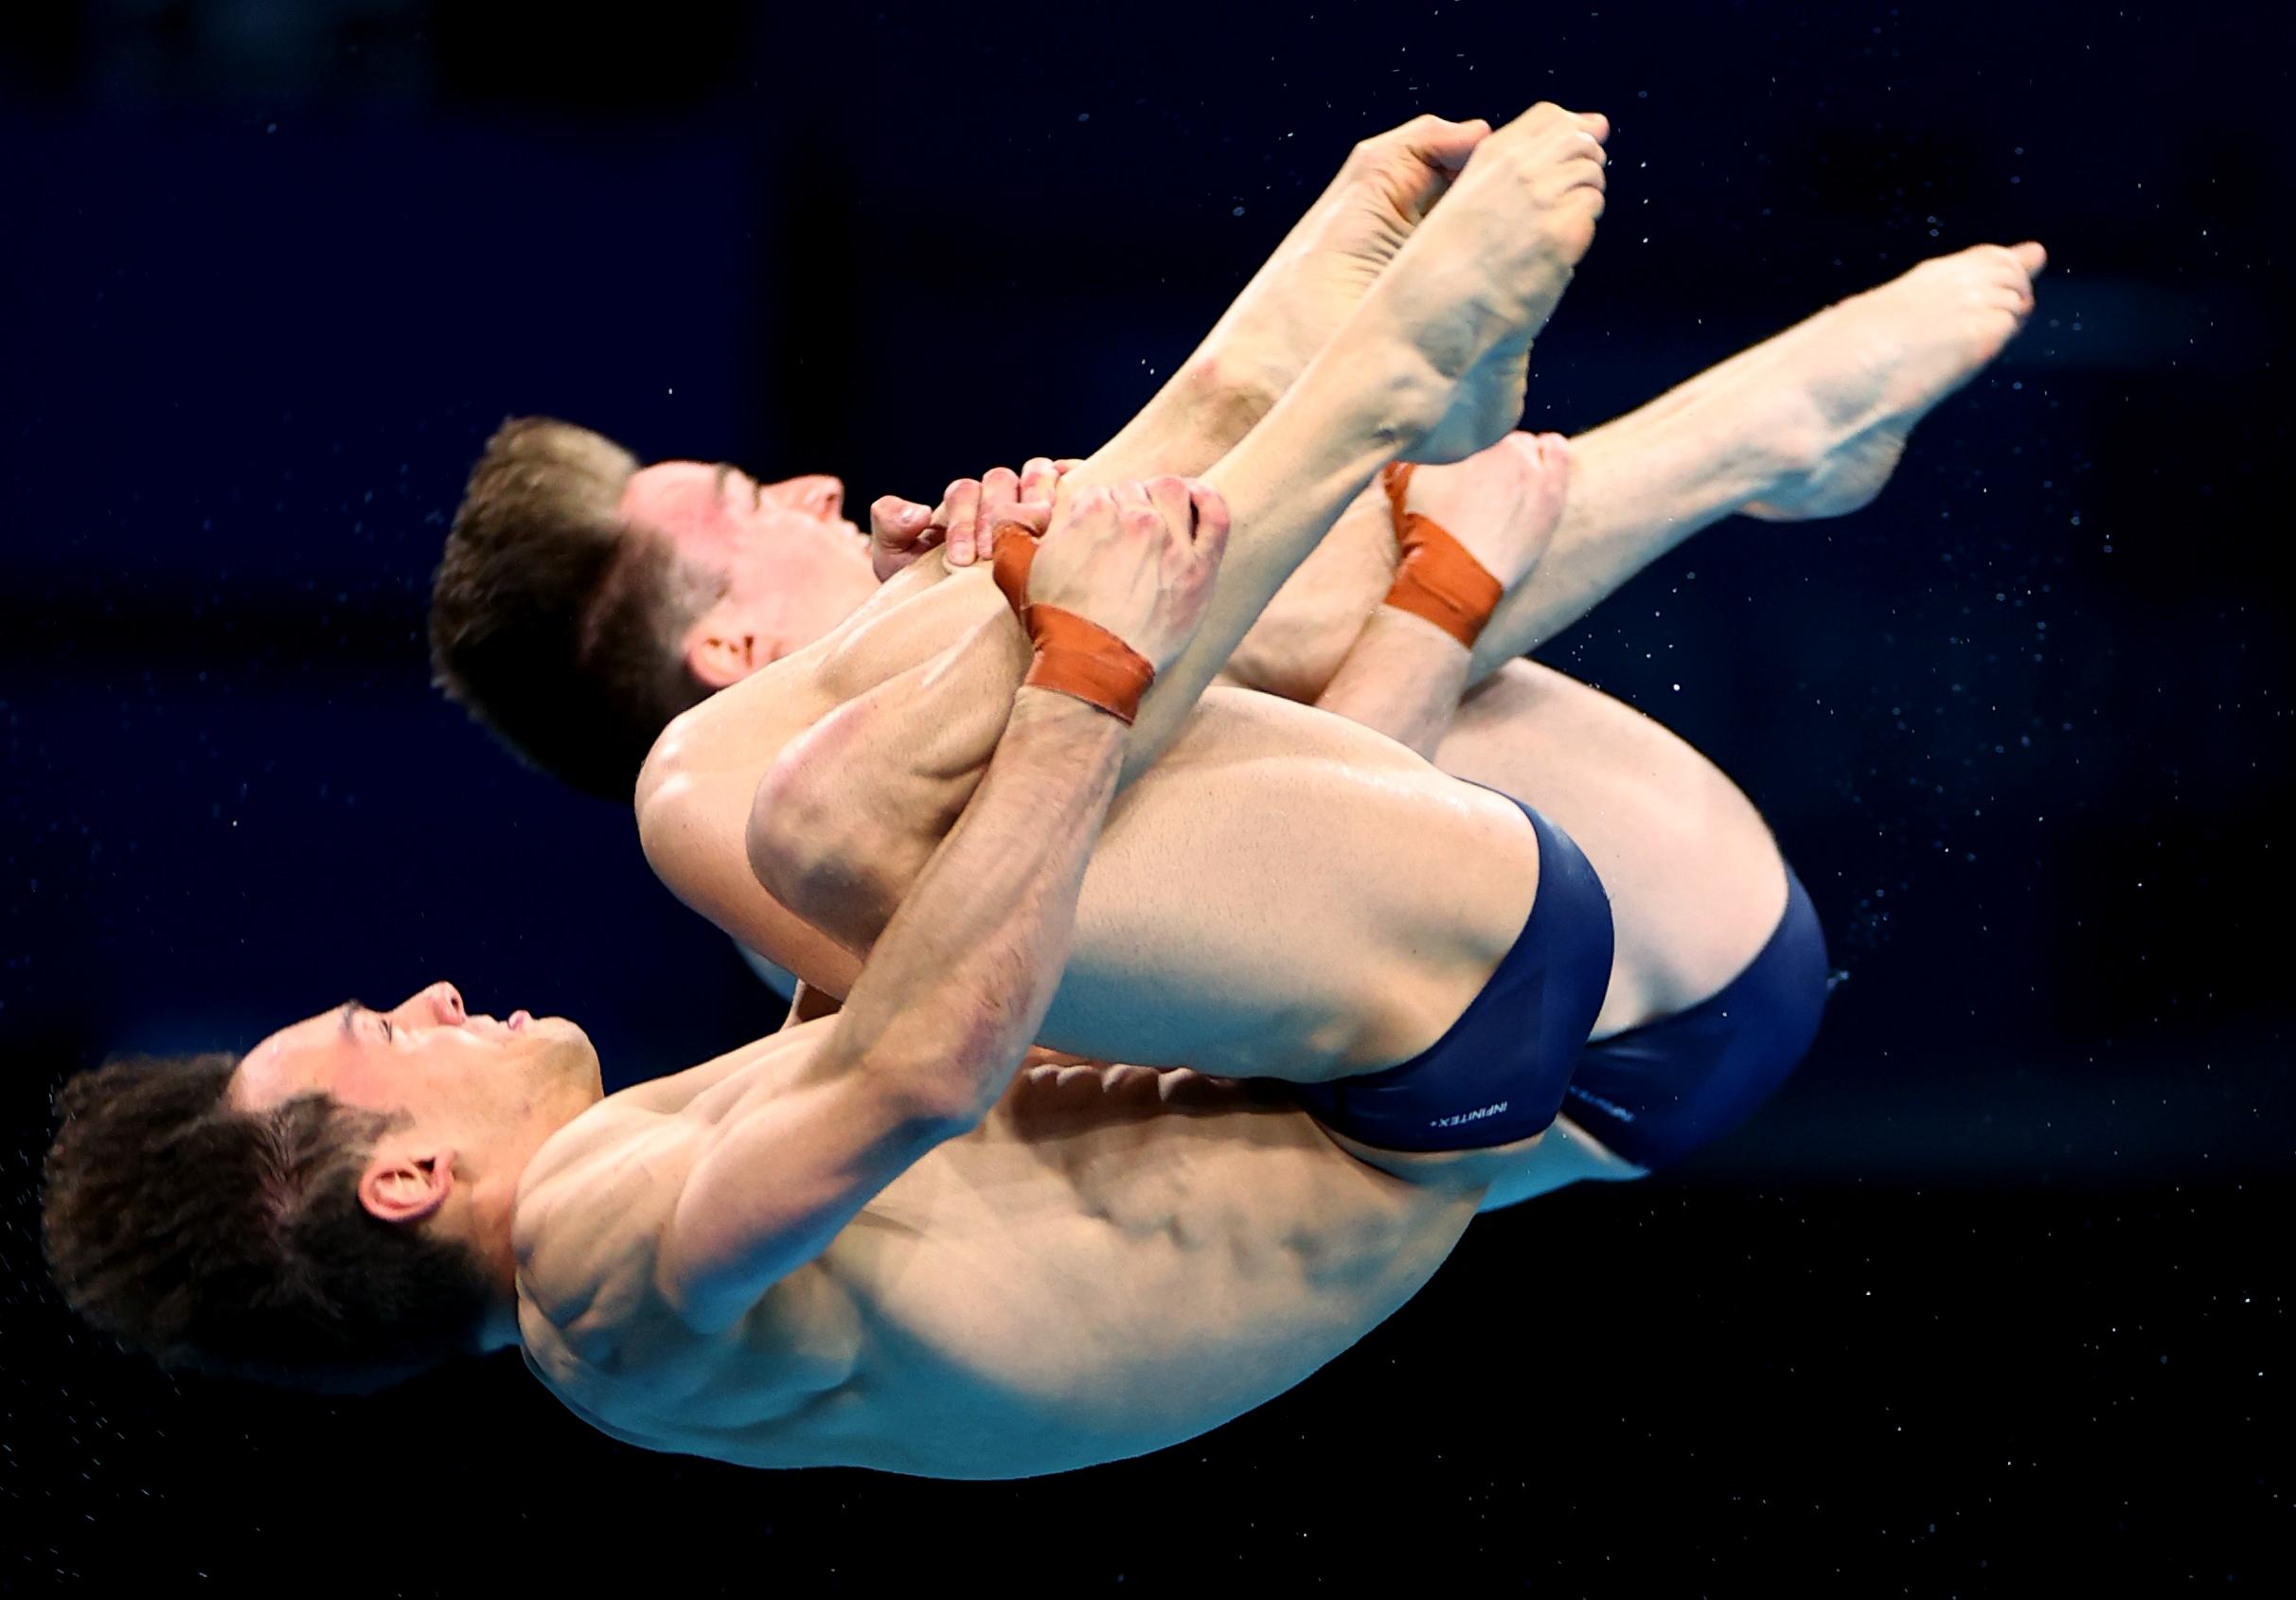 Tokyo 2020 Olympics - Diving - Men's 10m Platform Synchro - Final - Tokyo Aquatics Centre, Tokyo, Japan July 26, 2021. Thomas Daley of Britain and Matty Lee of Britain in action REUTERS/Marko Djurica